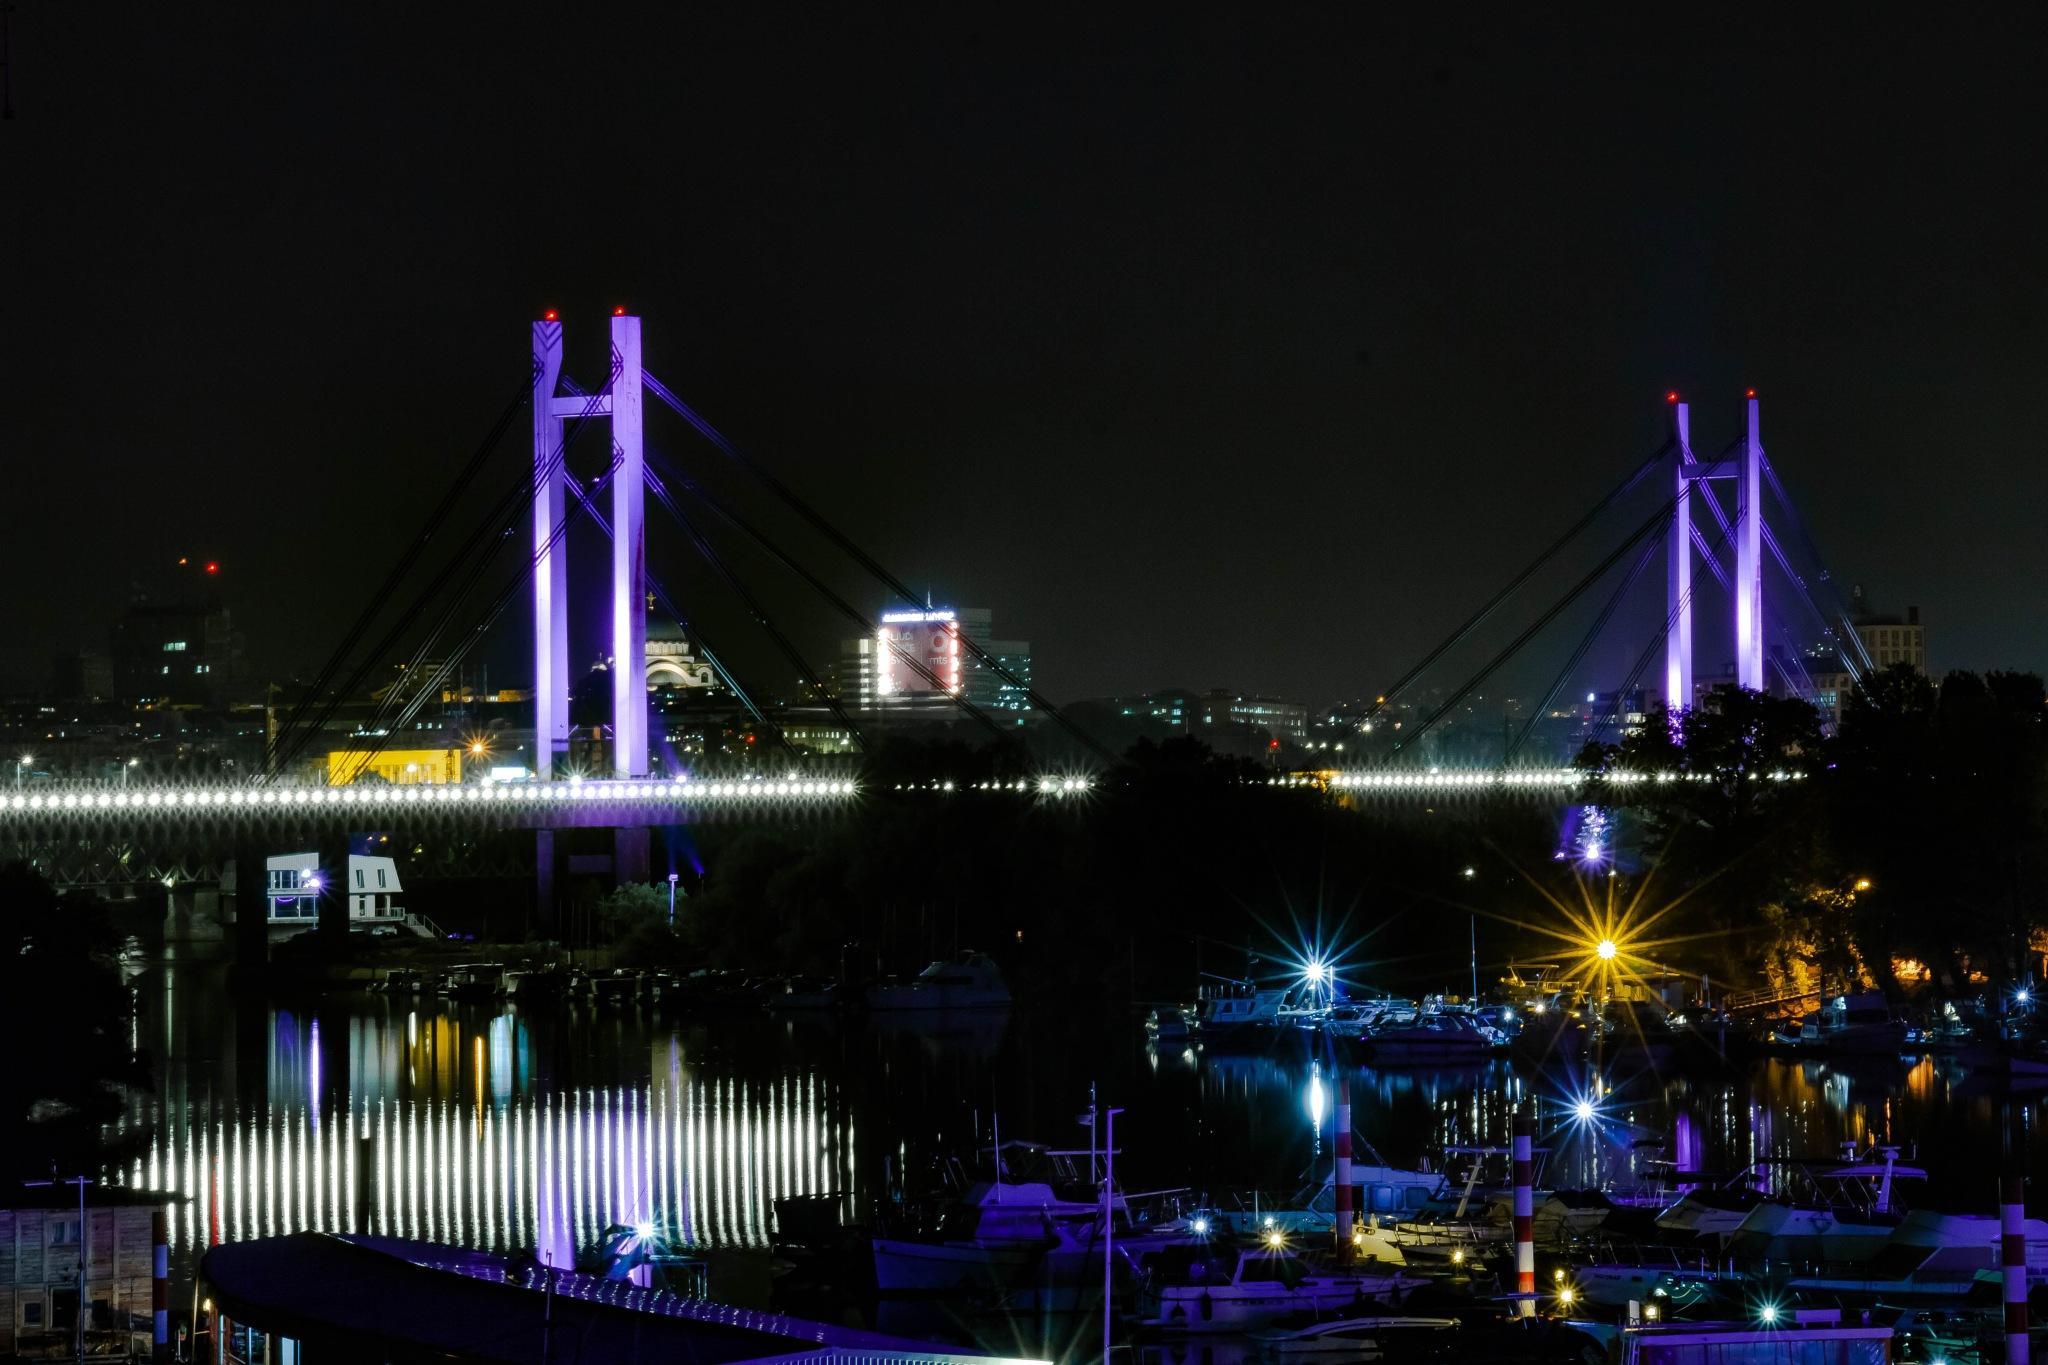 Just a bridge  by Daniel Paltsikov